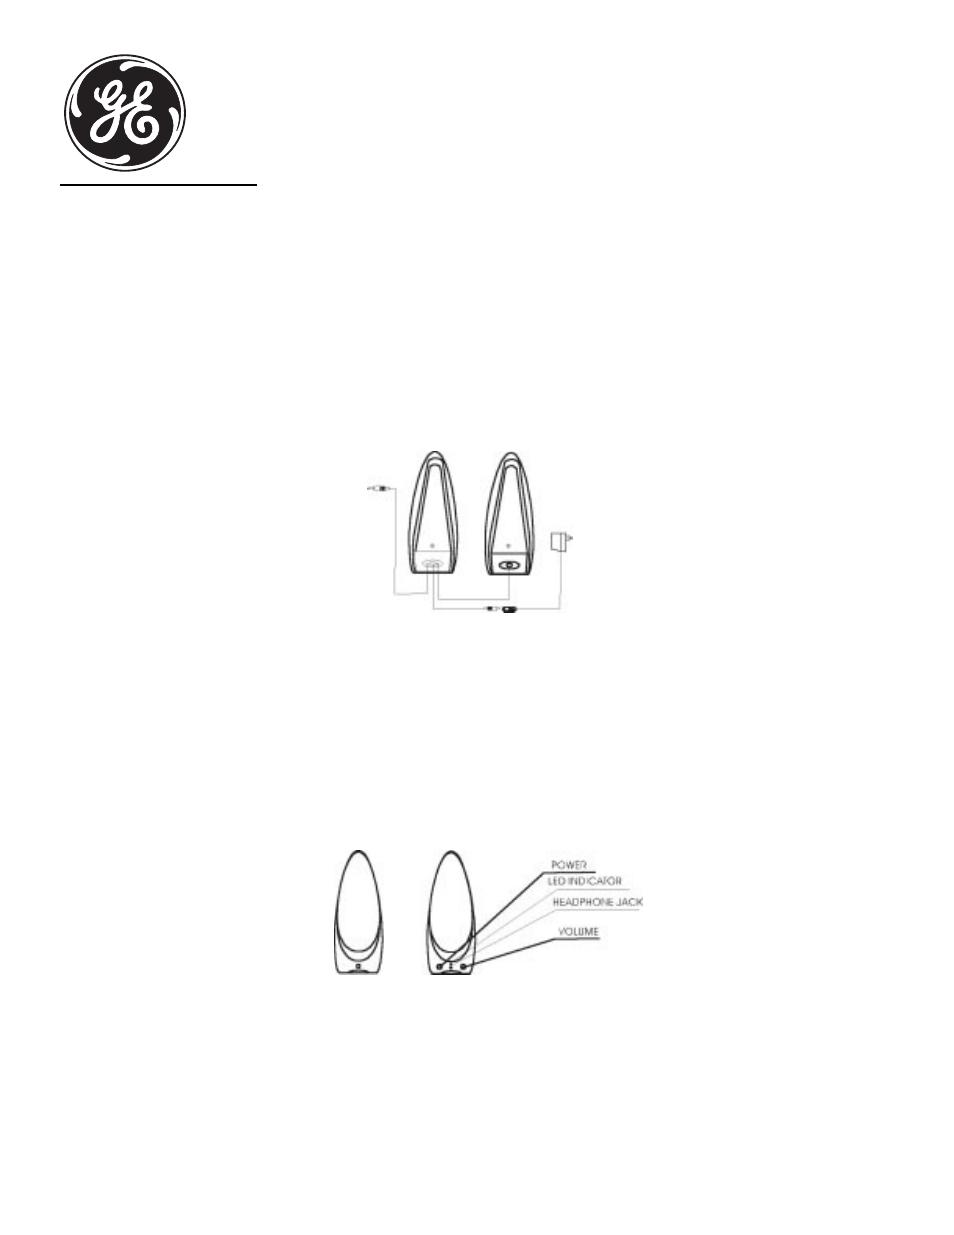 ge 98021 ge millennium speaker system user manual 2 pages rh manualsdir com GE Dynapower Speaker General Electric Computer Speakers